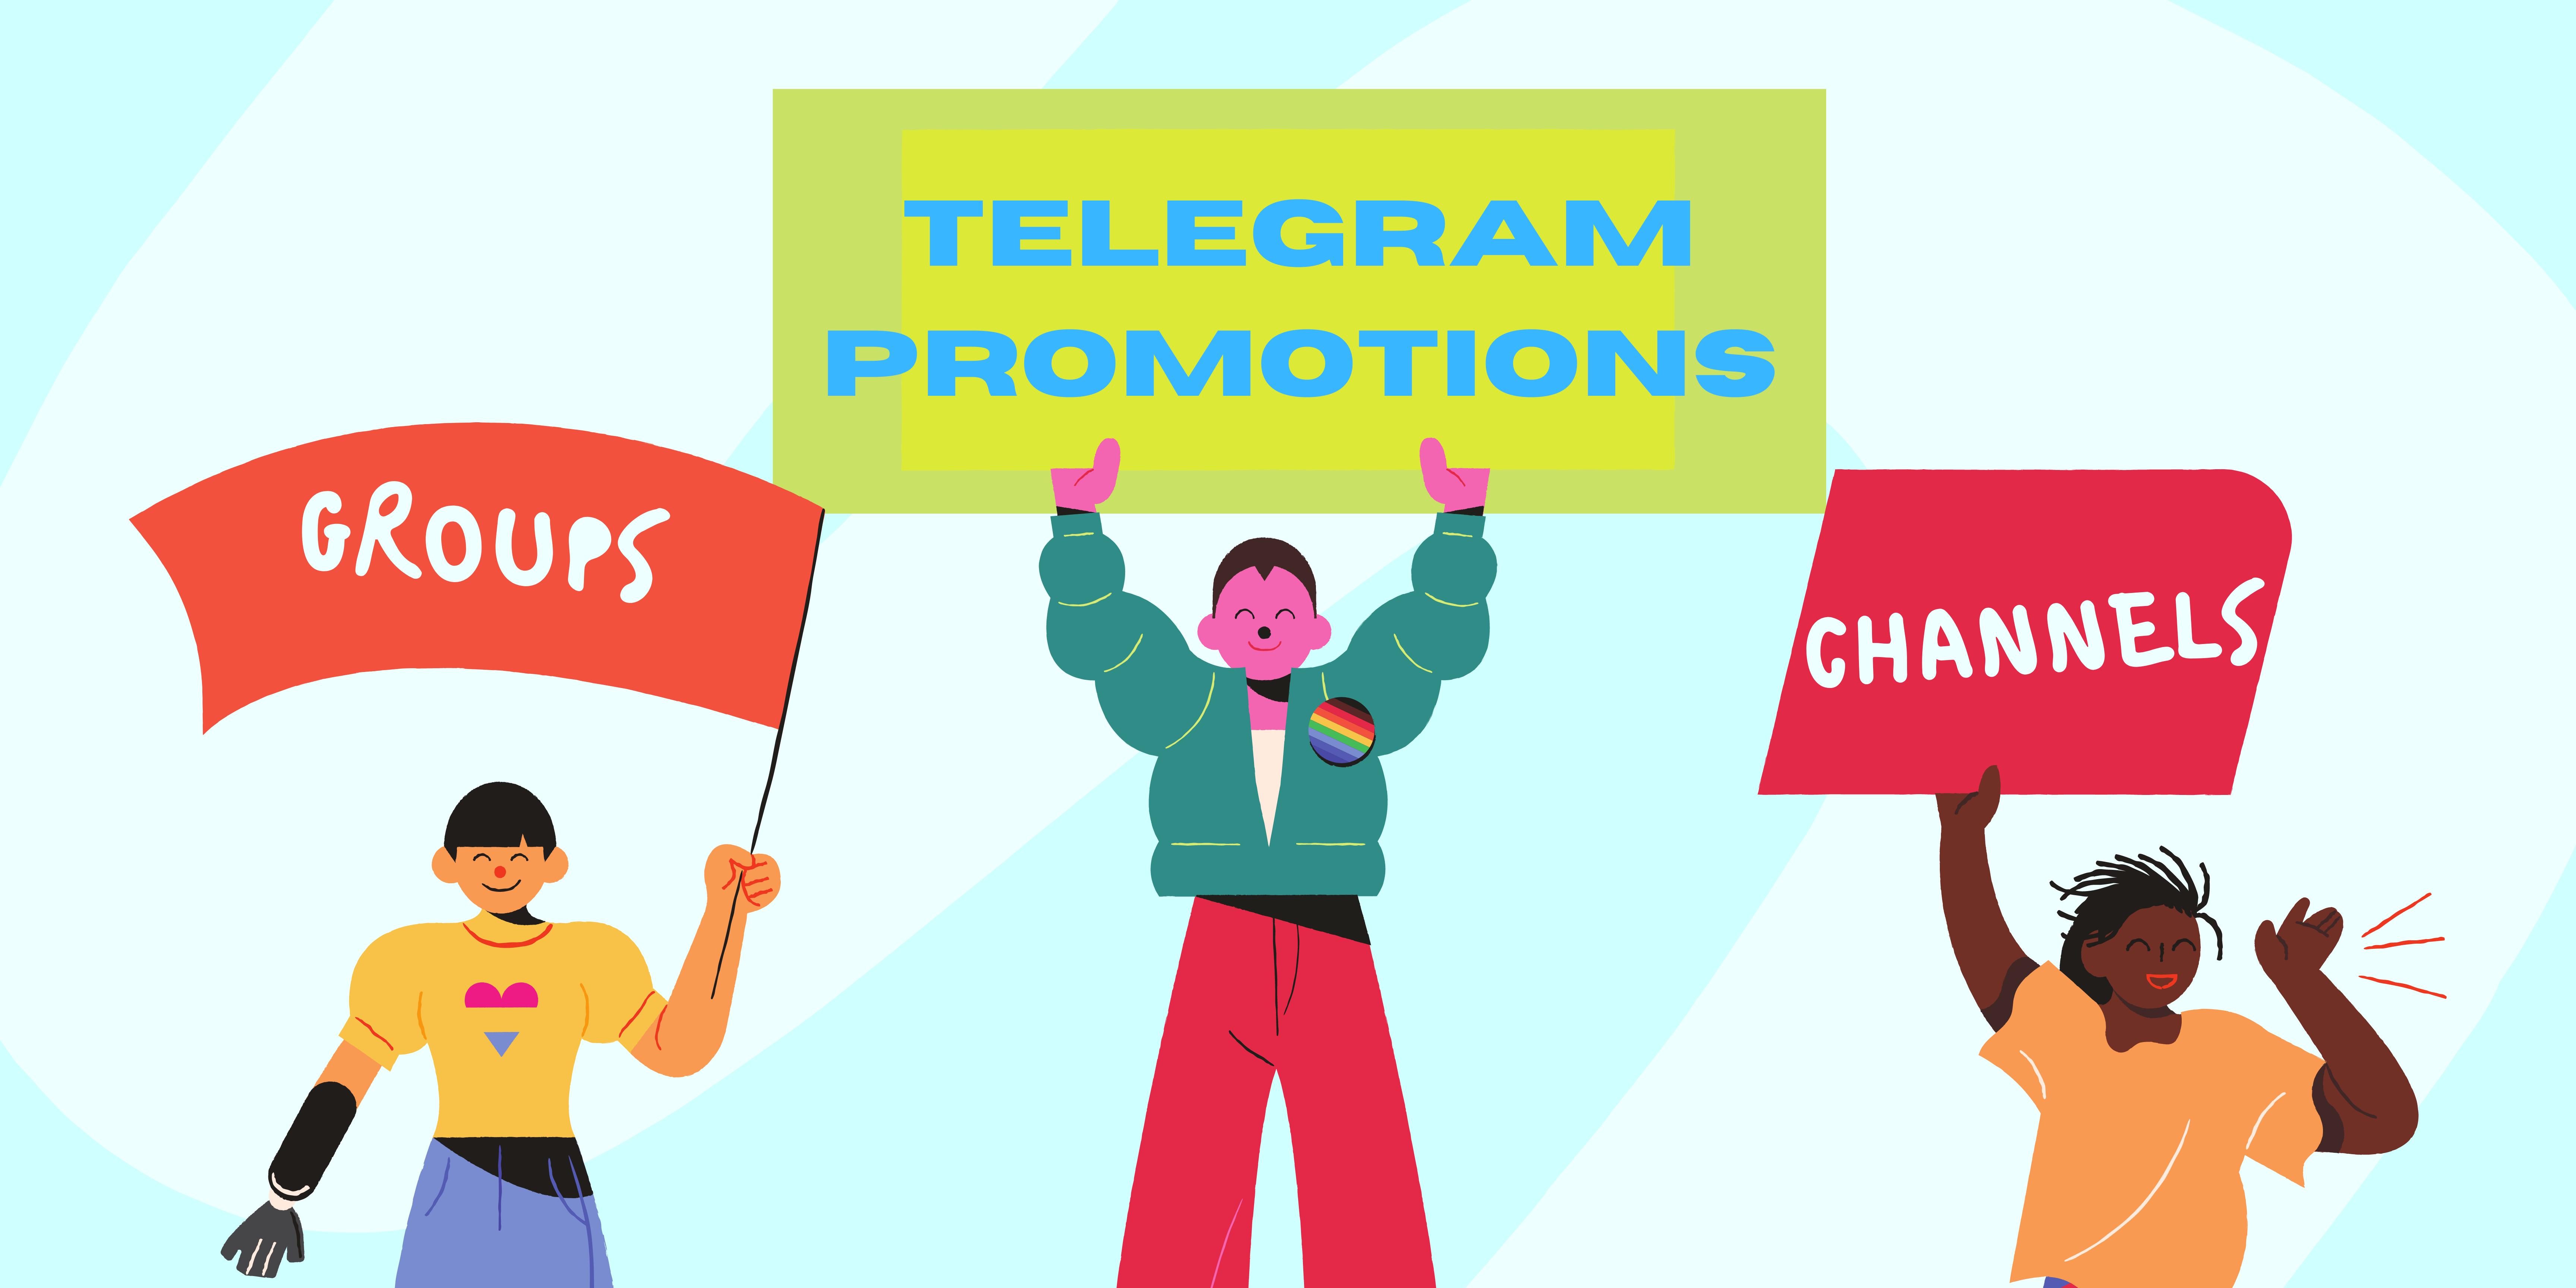 telegramguru promotions